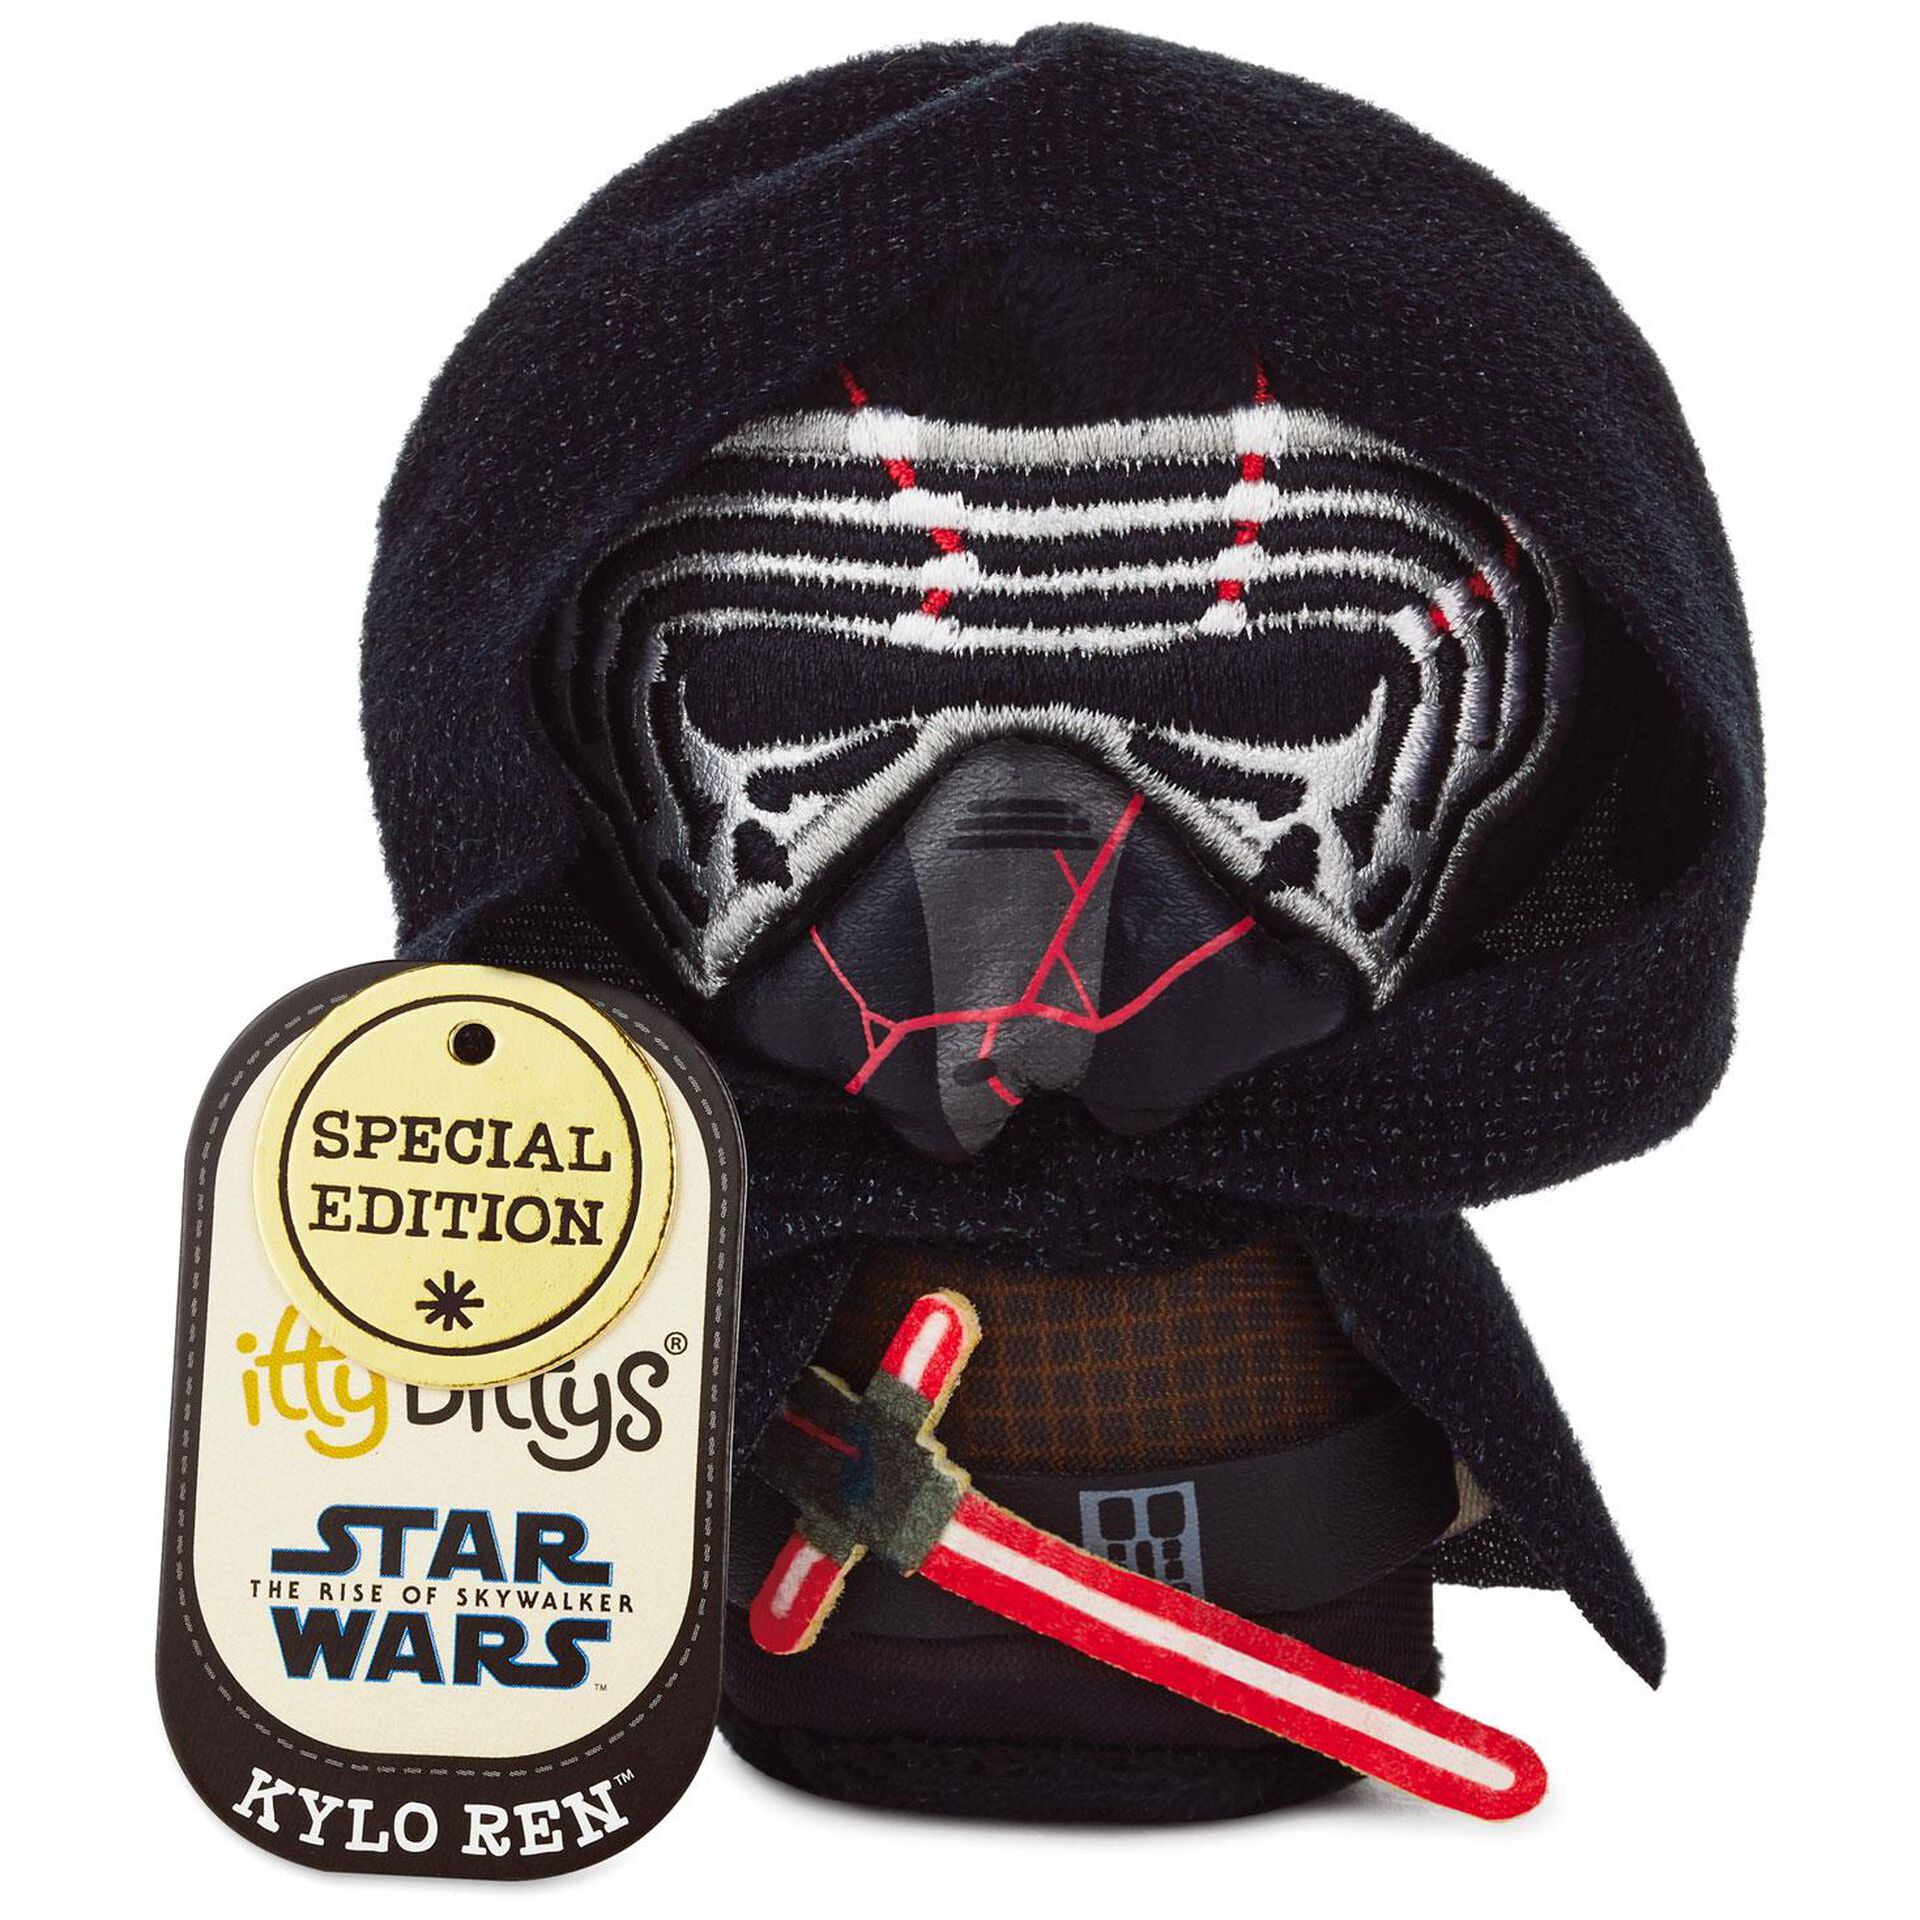 Itty Bittys Star Wars The Rise Of Skywalker Kylo Ren Plush Itty Bittys Hallmark